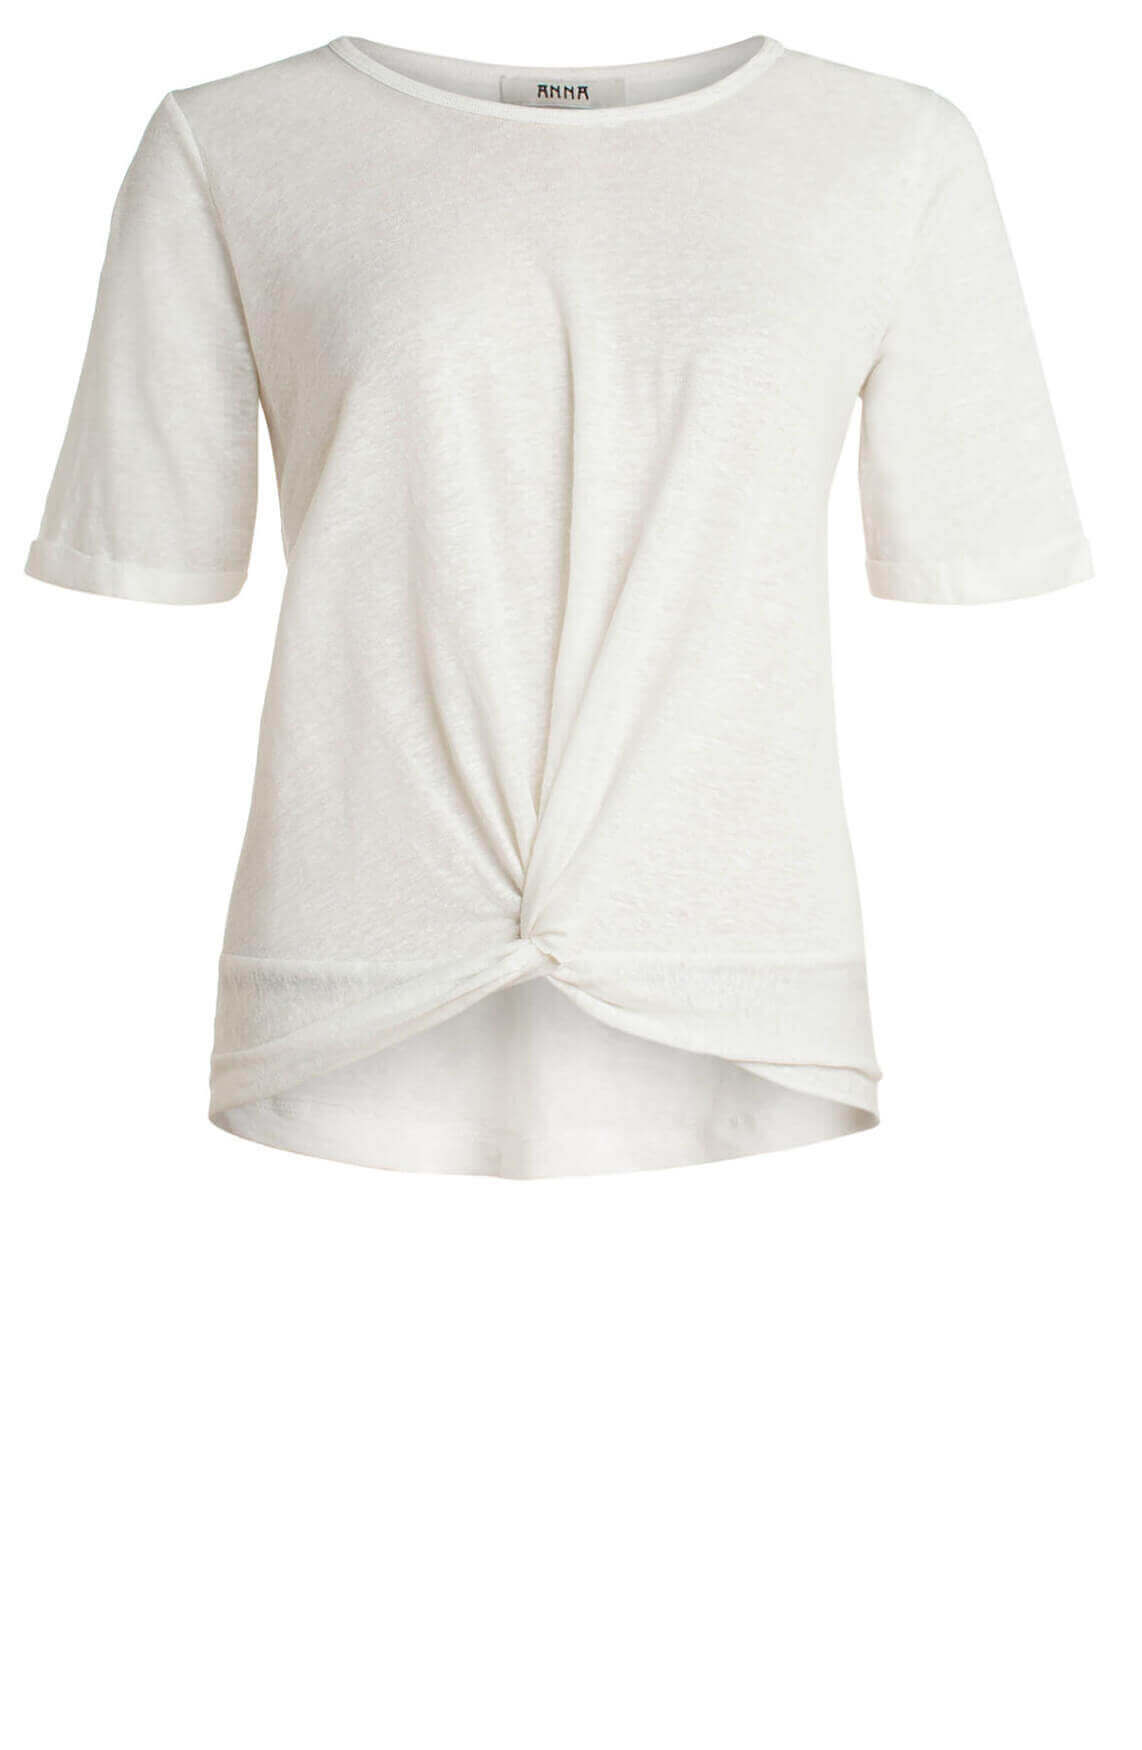 Anna Dames Shirt met knoopdetail wit